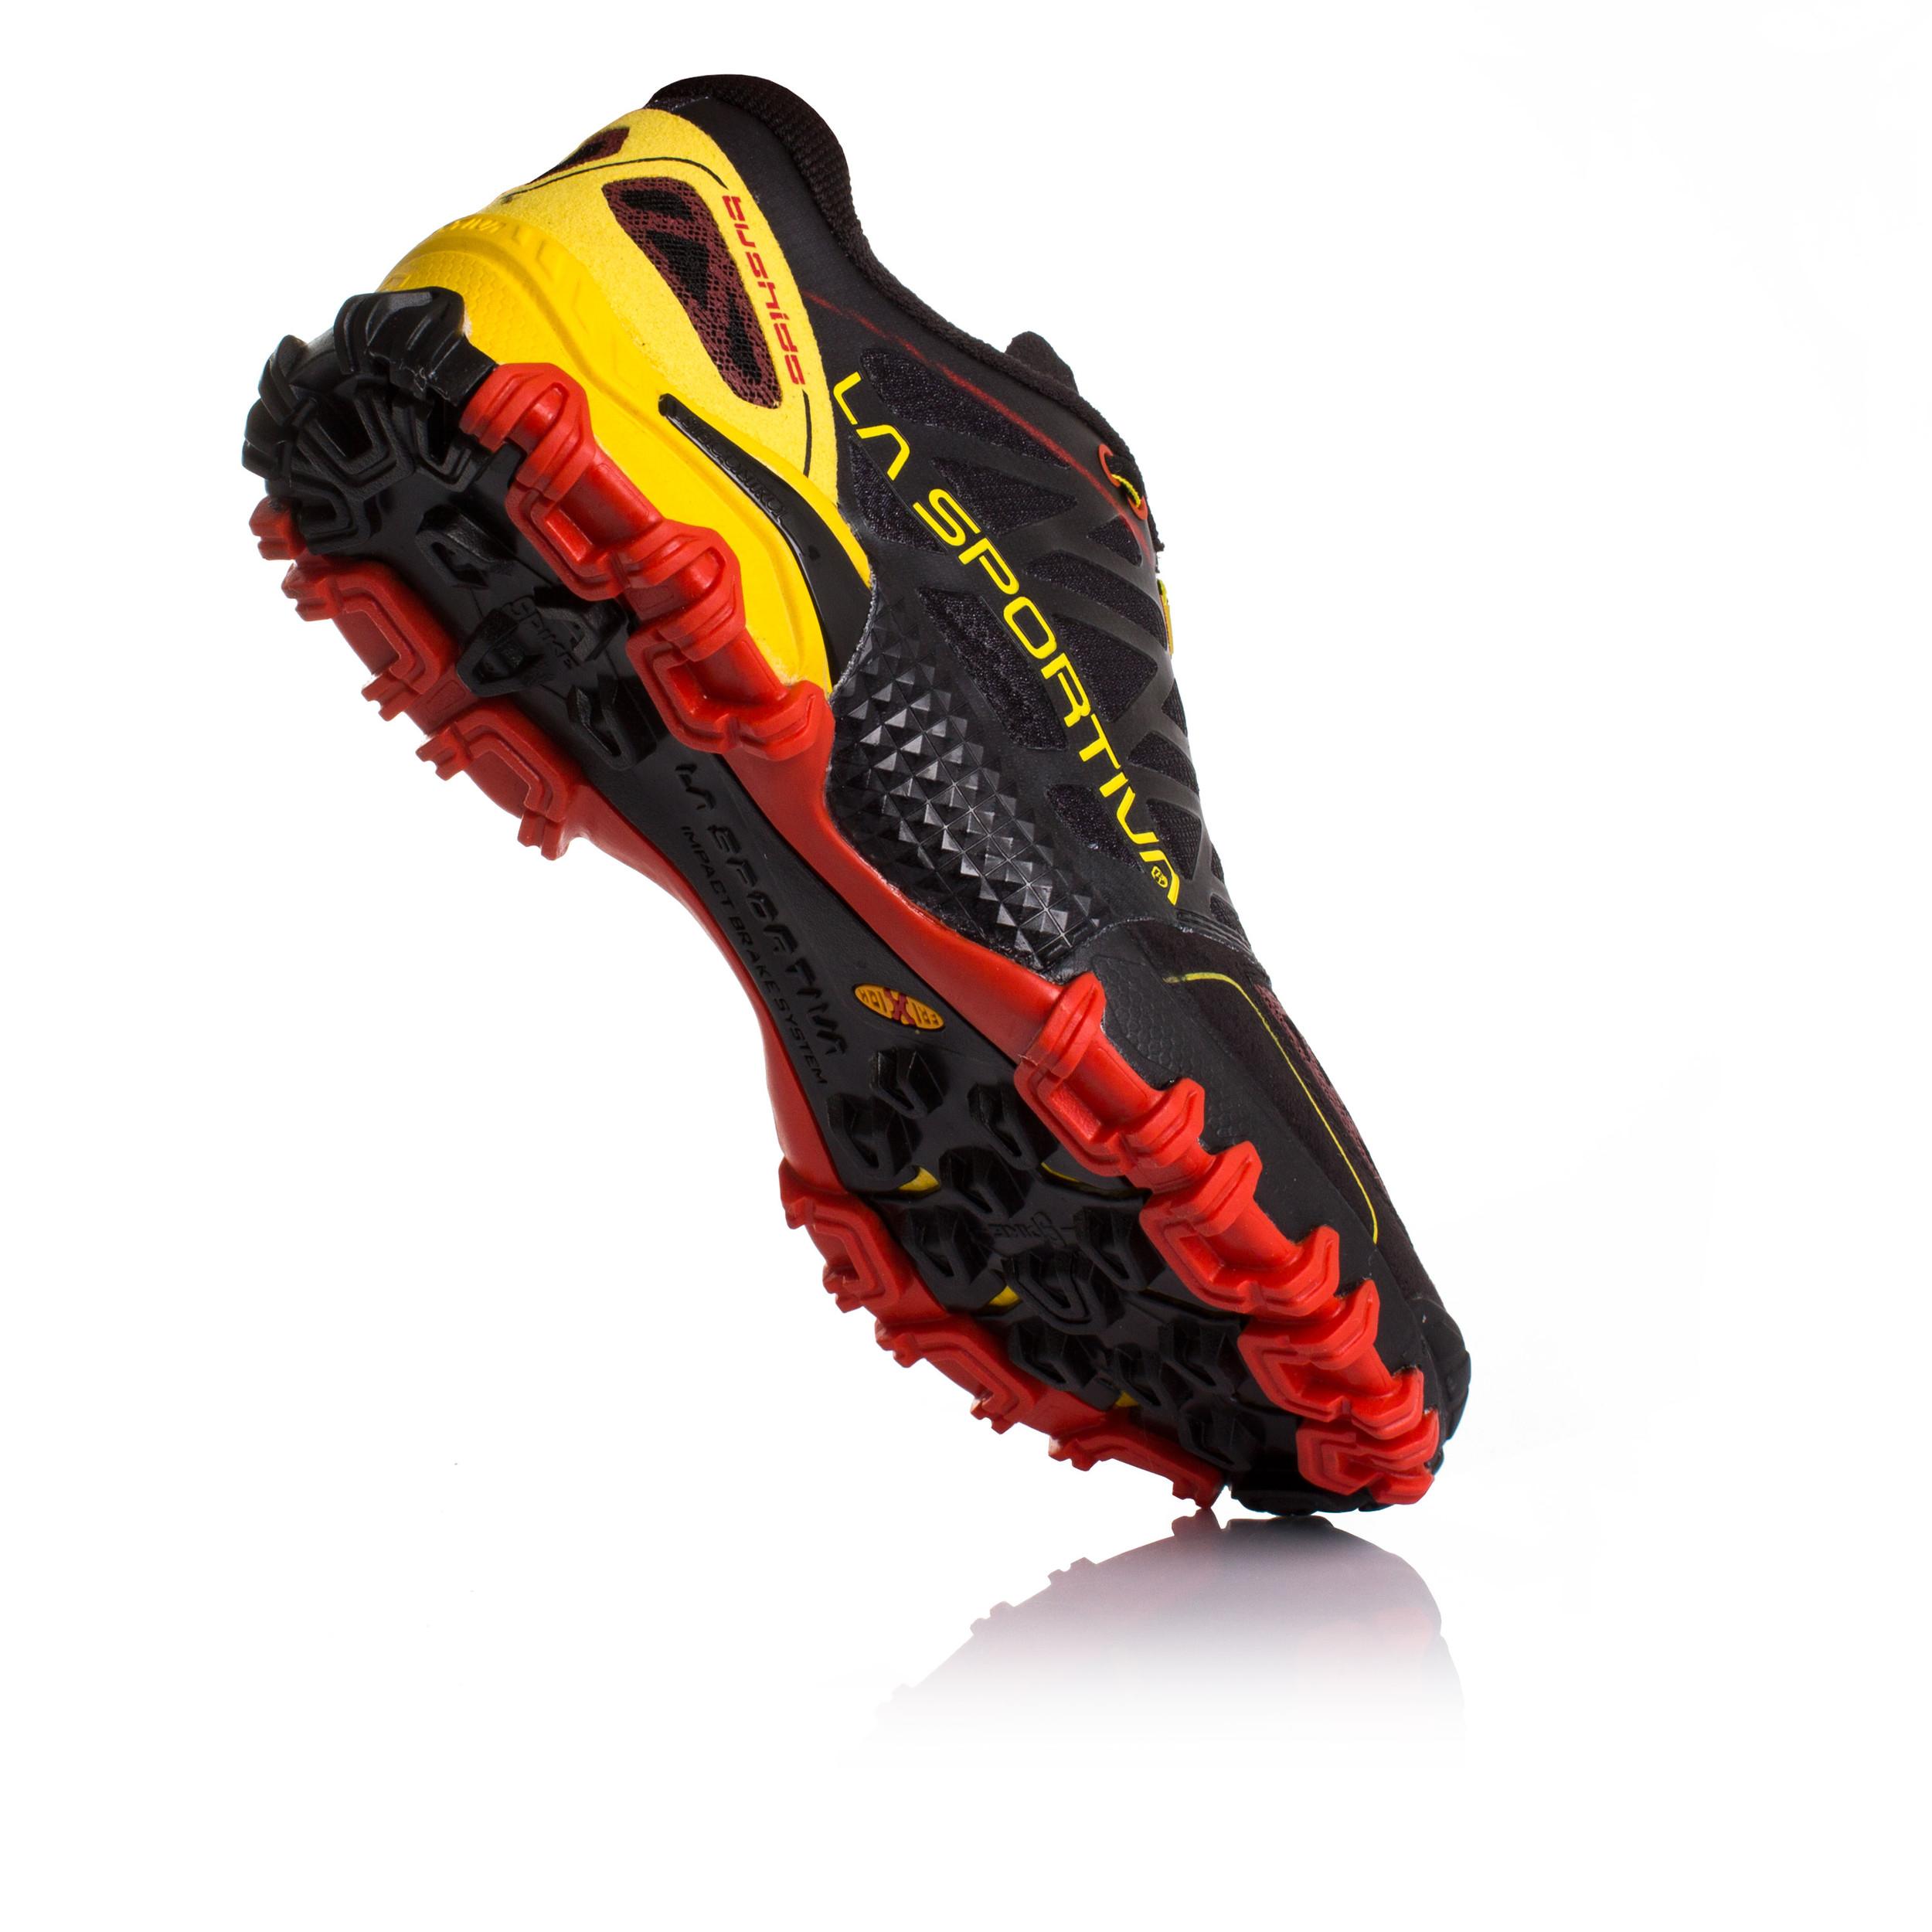 La Sportiva Bushido Trail Herren Laufschuhe Turnschuhe Turnschuhe Turnschuhe Sport Schuhe Mehrfarbig    Elegante Und Stabile Verpackung  c6d5d4